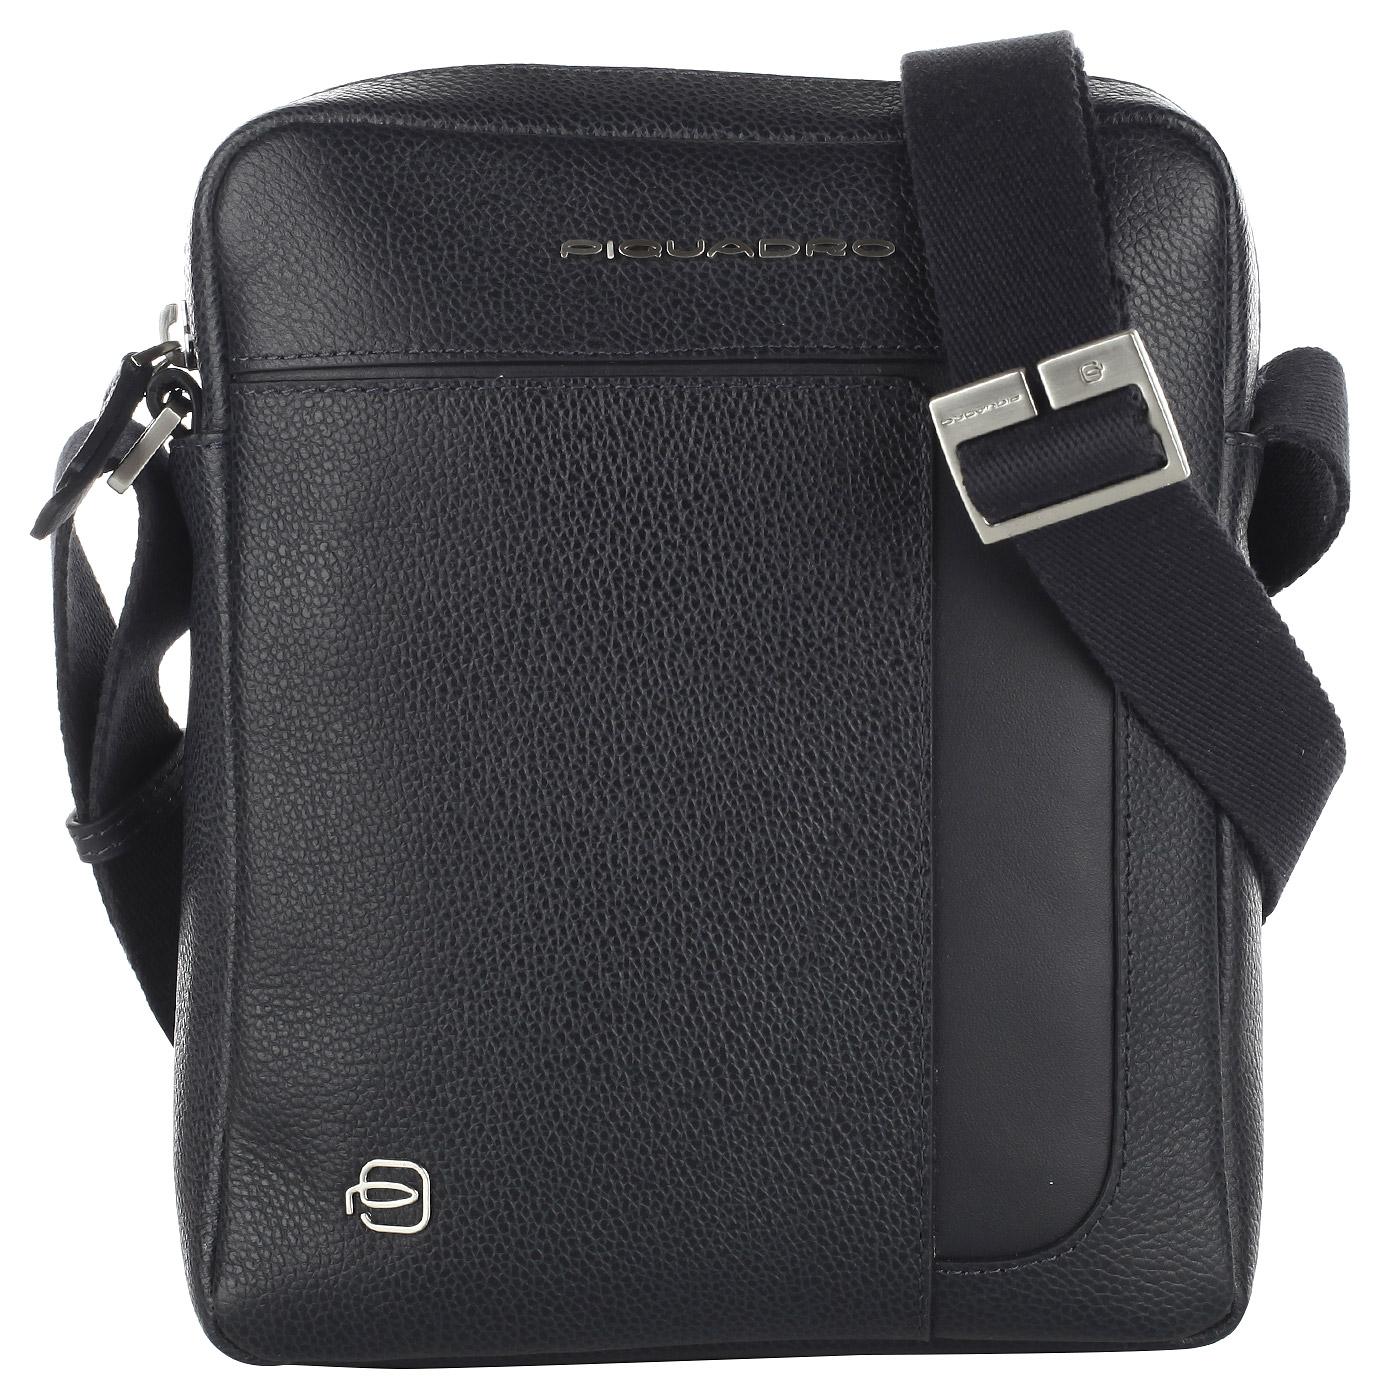 54edd7ce2643 Мужская сумка-планшет из натуральной кожи Piquadro Pan CA4290S95/BLU ...